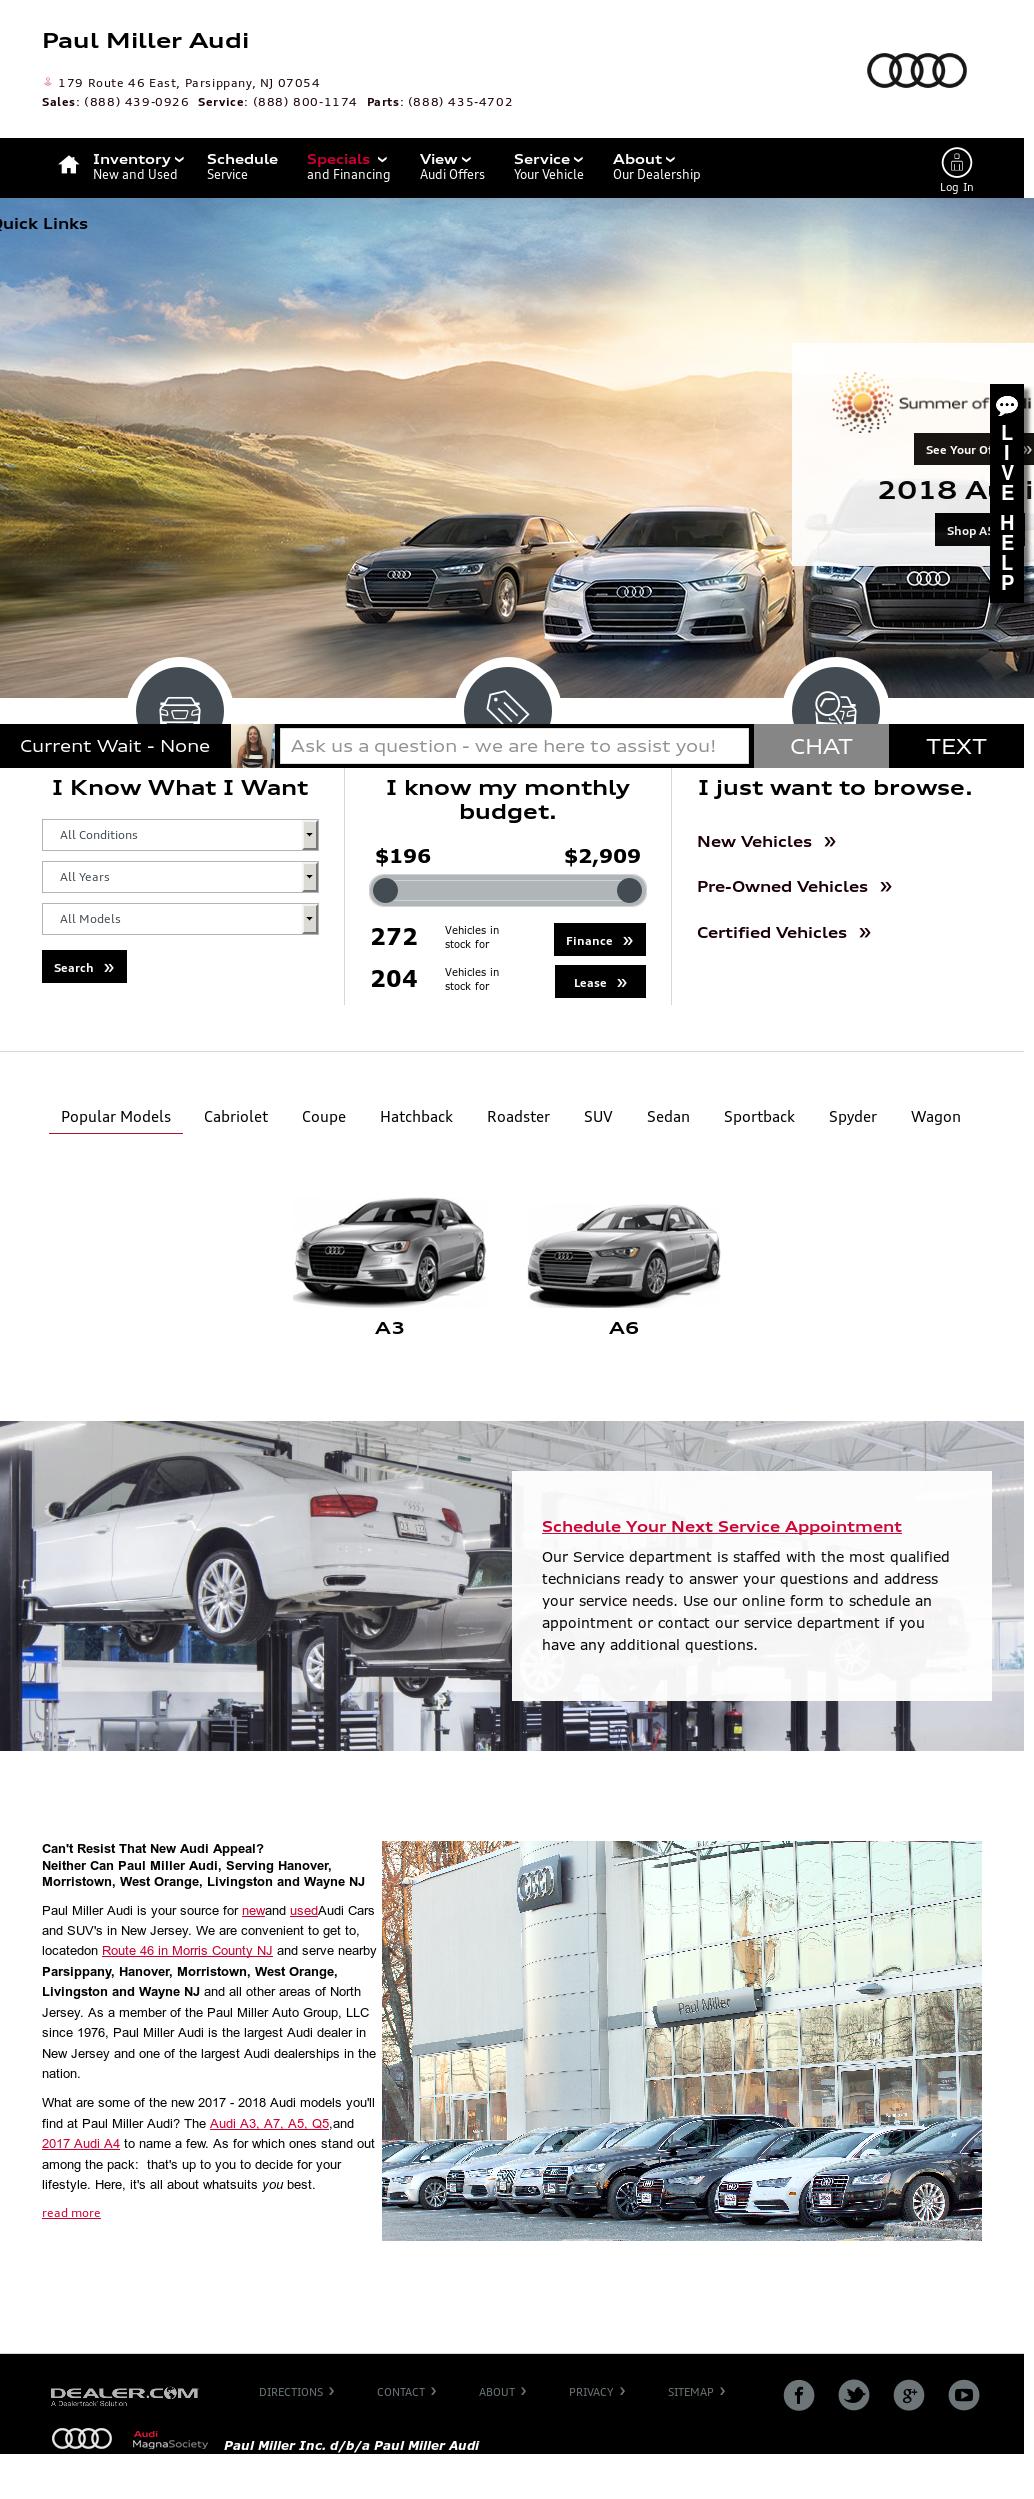 Paul Miller Auto Group